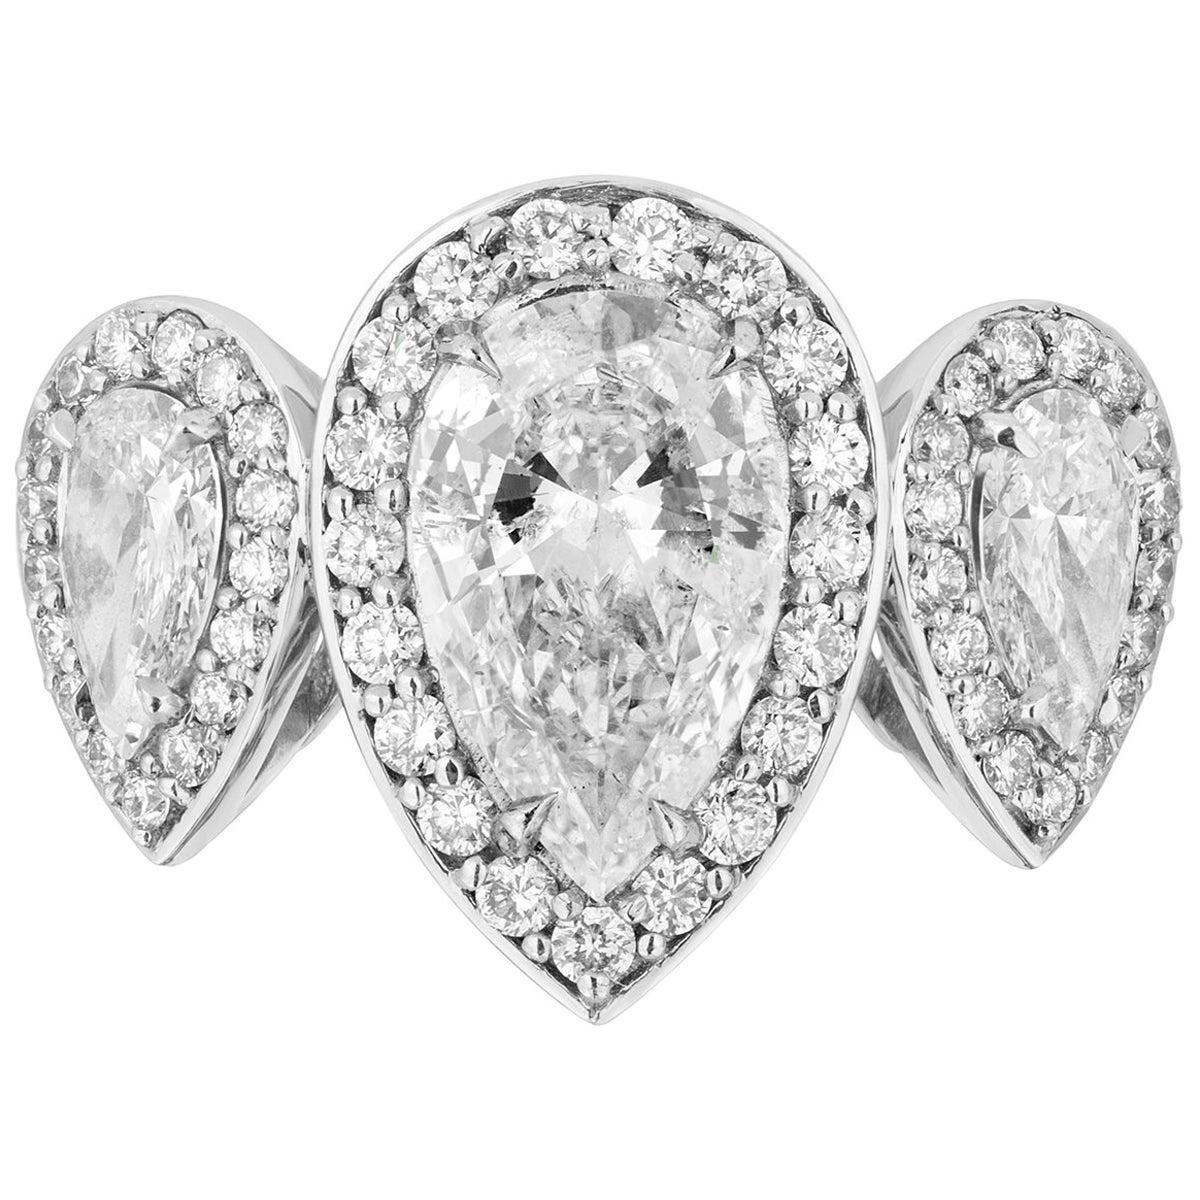 2.17 Carat Pear Shaped Diamond Three-Stone Ring